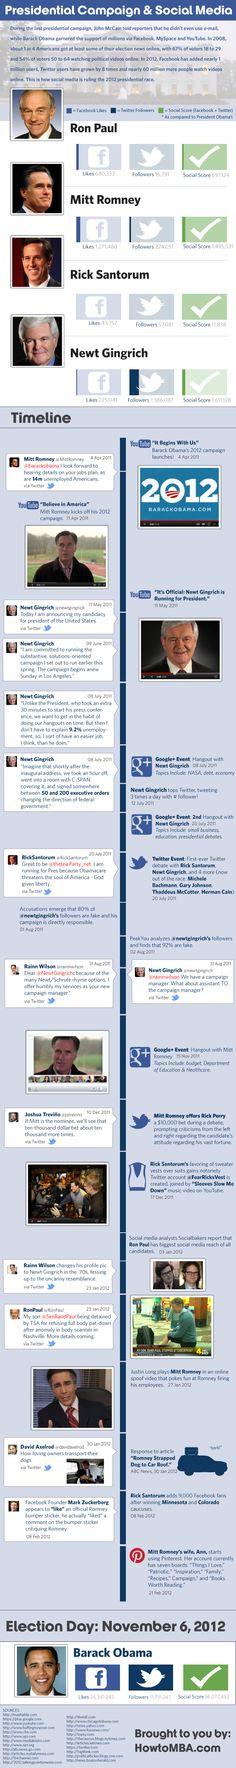 www.brandequitystudios.com Presidential campaign ; Social Media #infographic